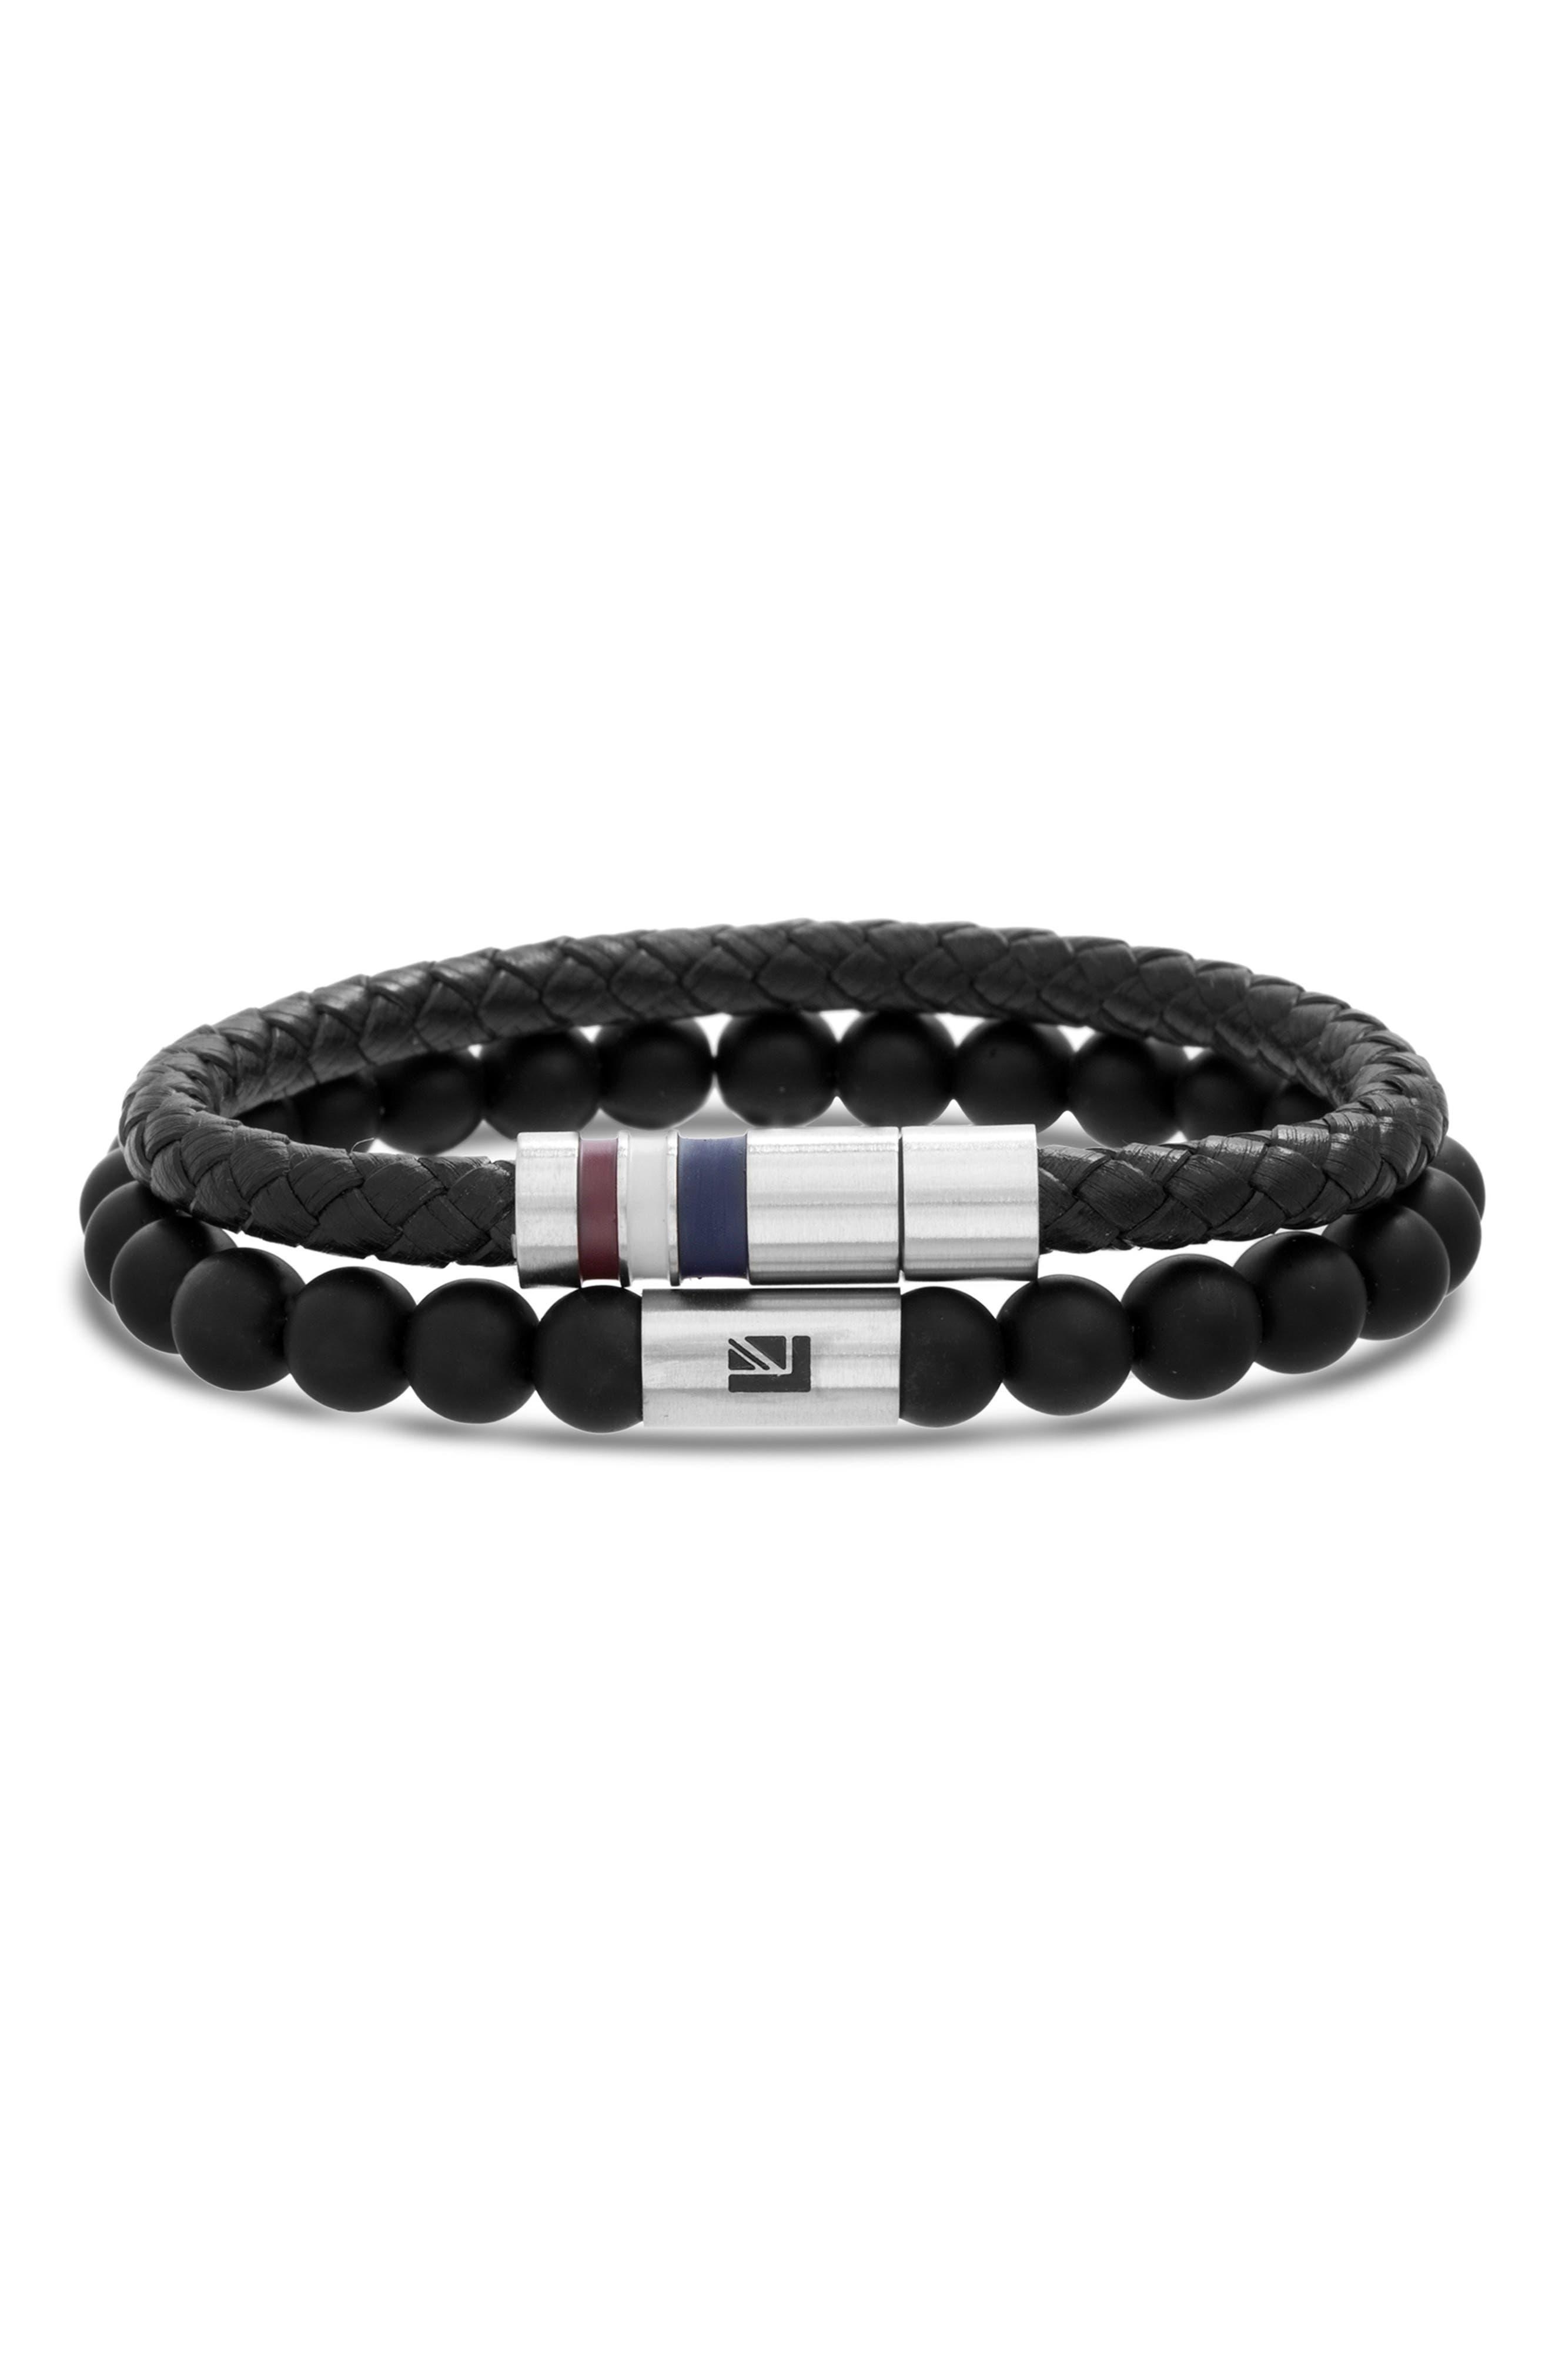 BEN SHERMAN, Leather & Bead Bracelet Set, Main thumbnail 1, color, BLACK